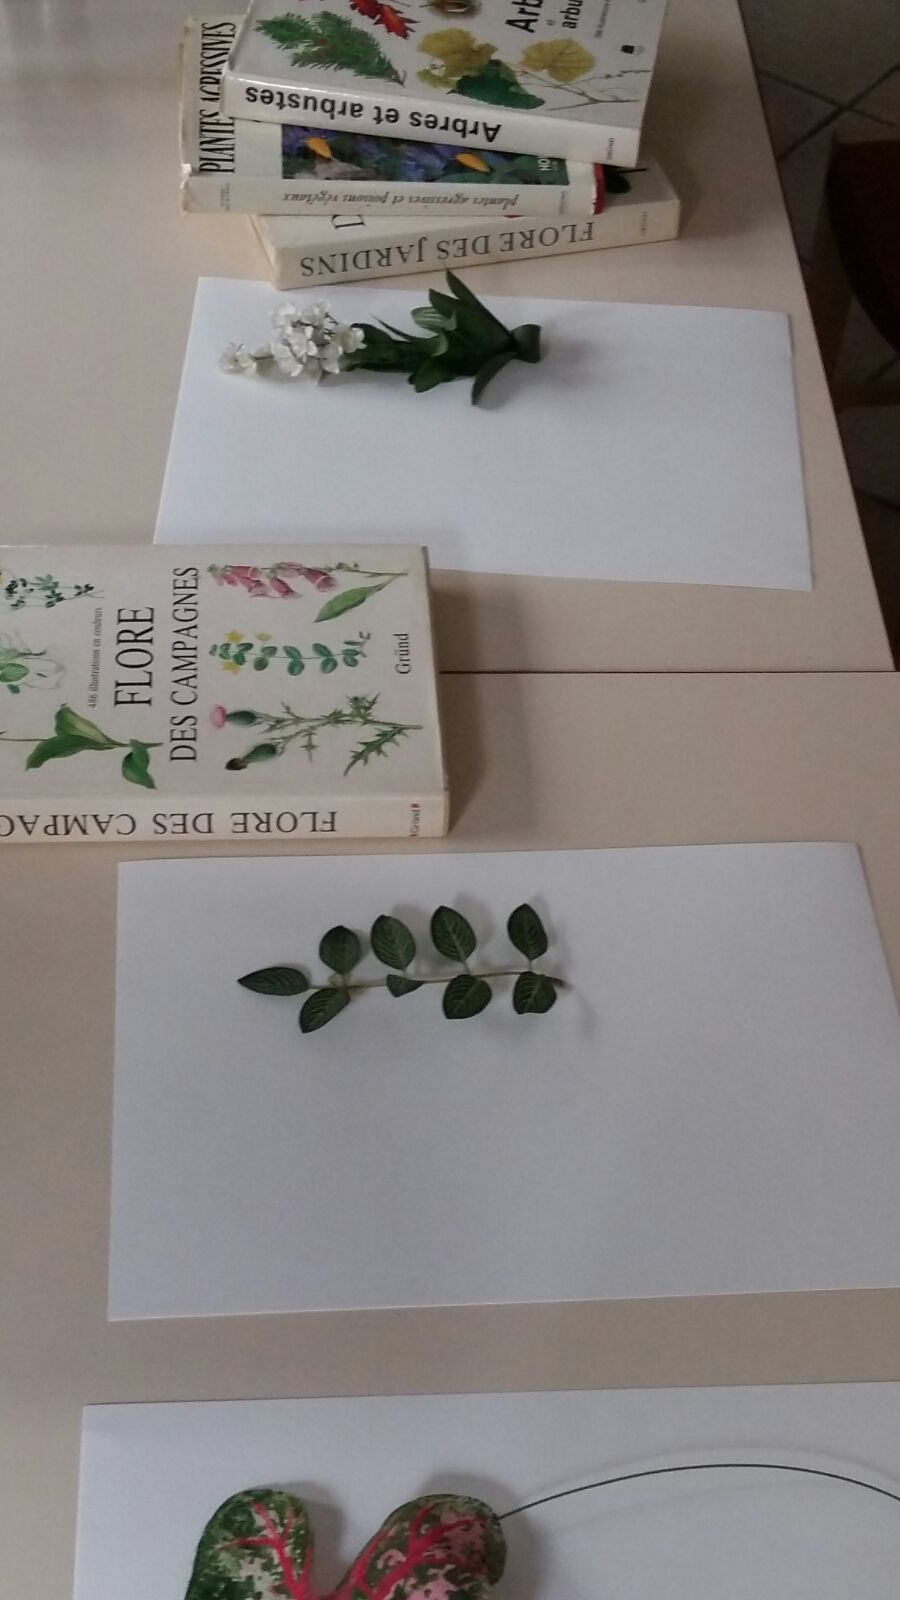 herbier-artificiel4-ingrid-paola-amaro-2016